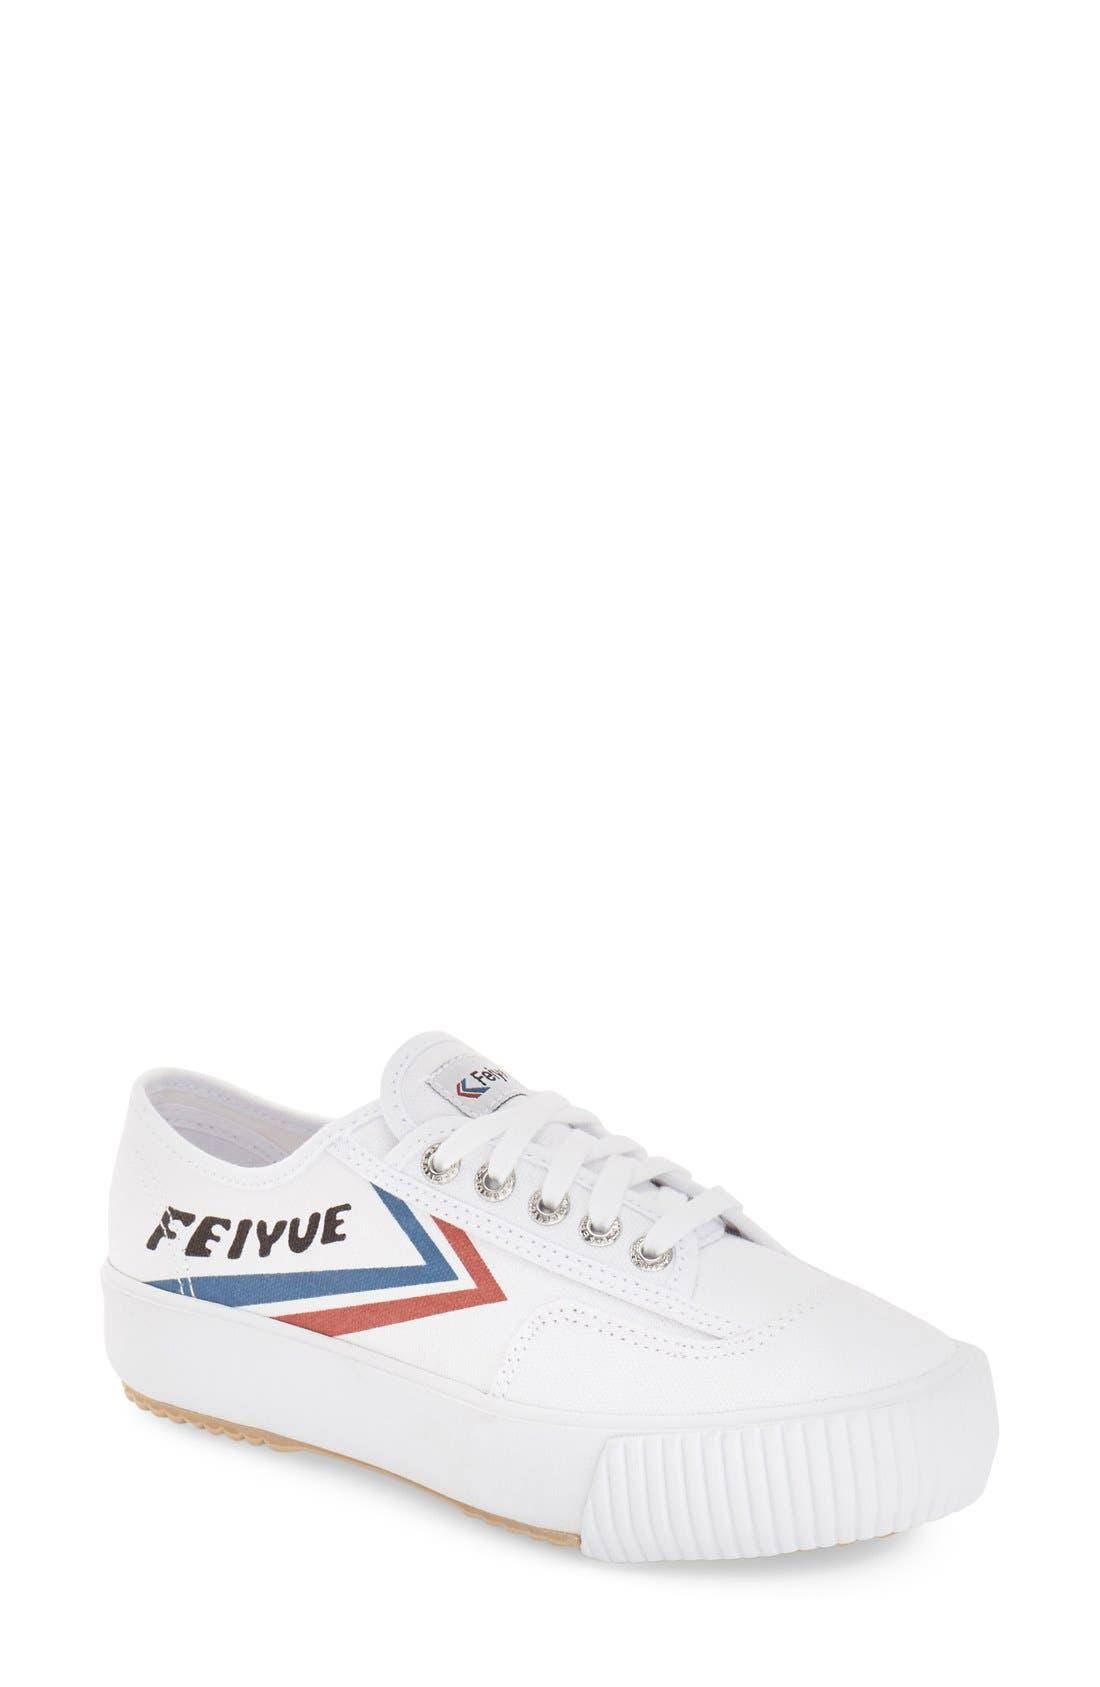 Alternate Image 1 Selected - Feiyue. 'Fe Lo Platform' Canvas Sneaker (Women)